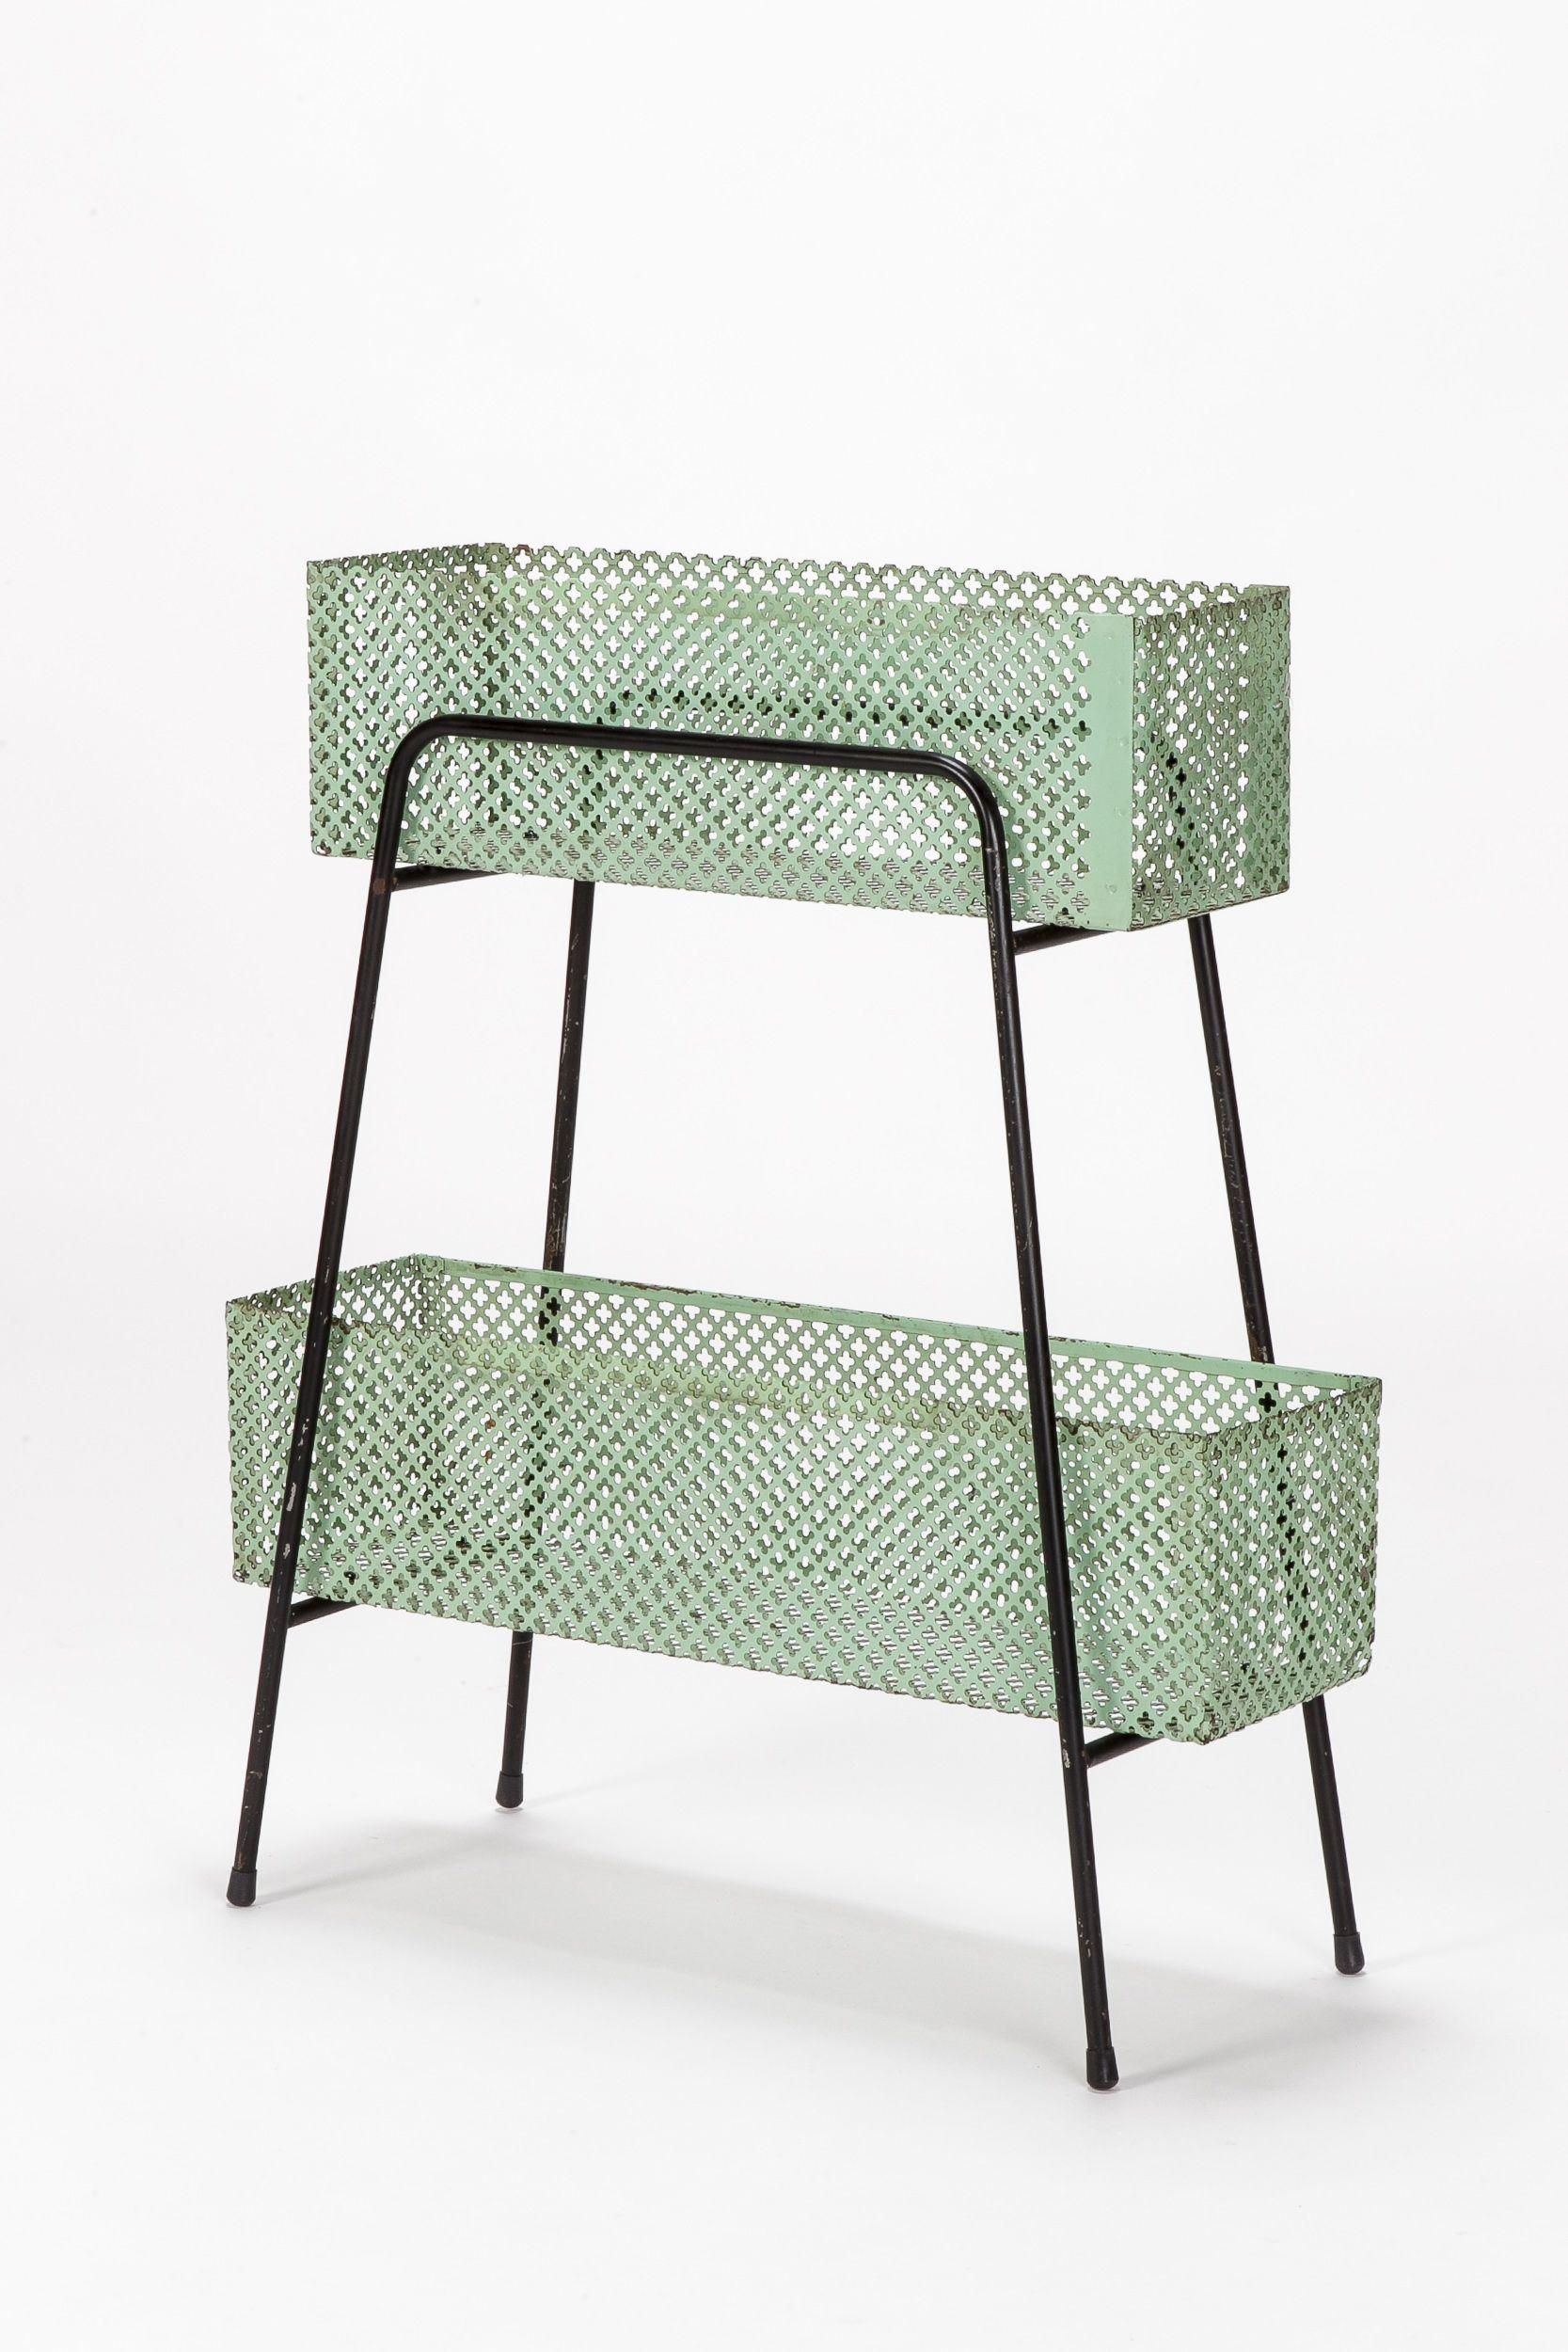 Mathieu Matégot; Enameled Metal Planter, 1950s. | cosas | Pinterest ...